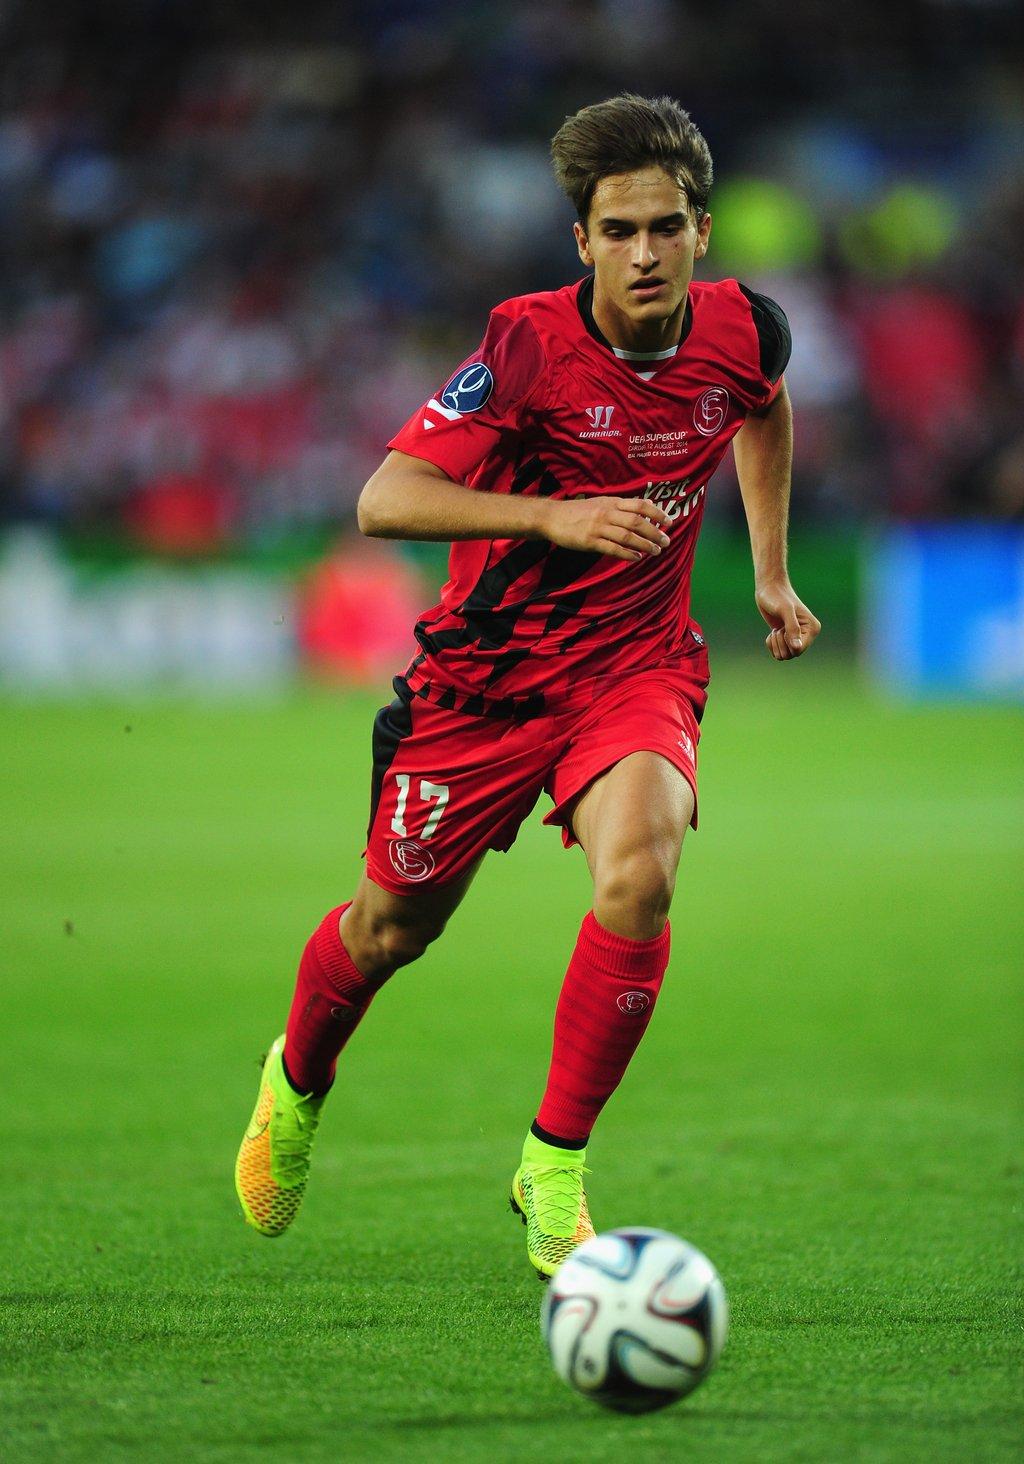 Denis Suarez to join the club on loan | News | Arsenal com